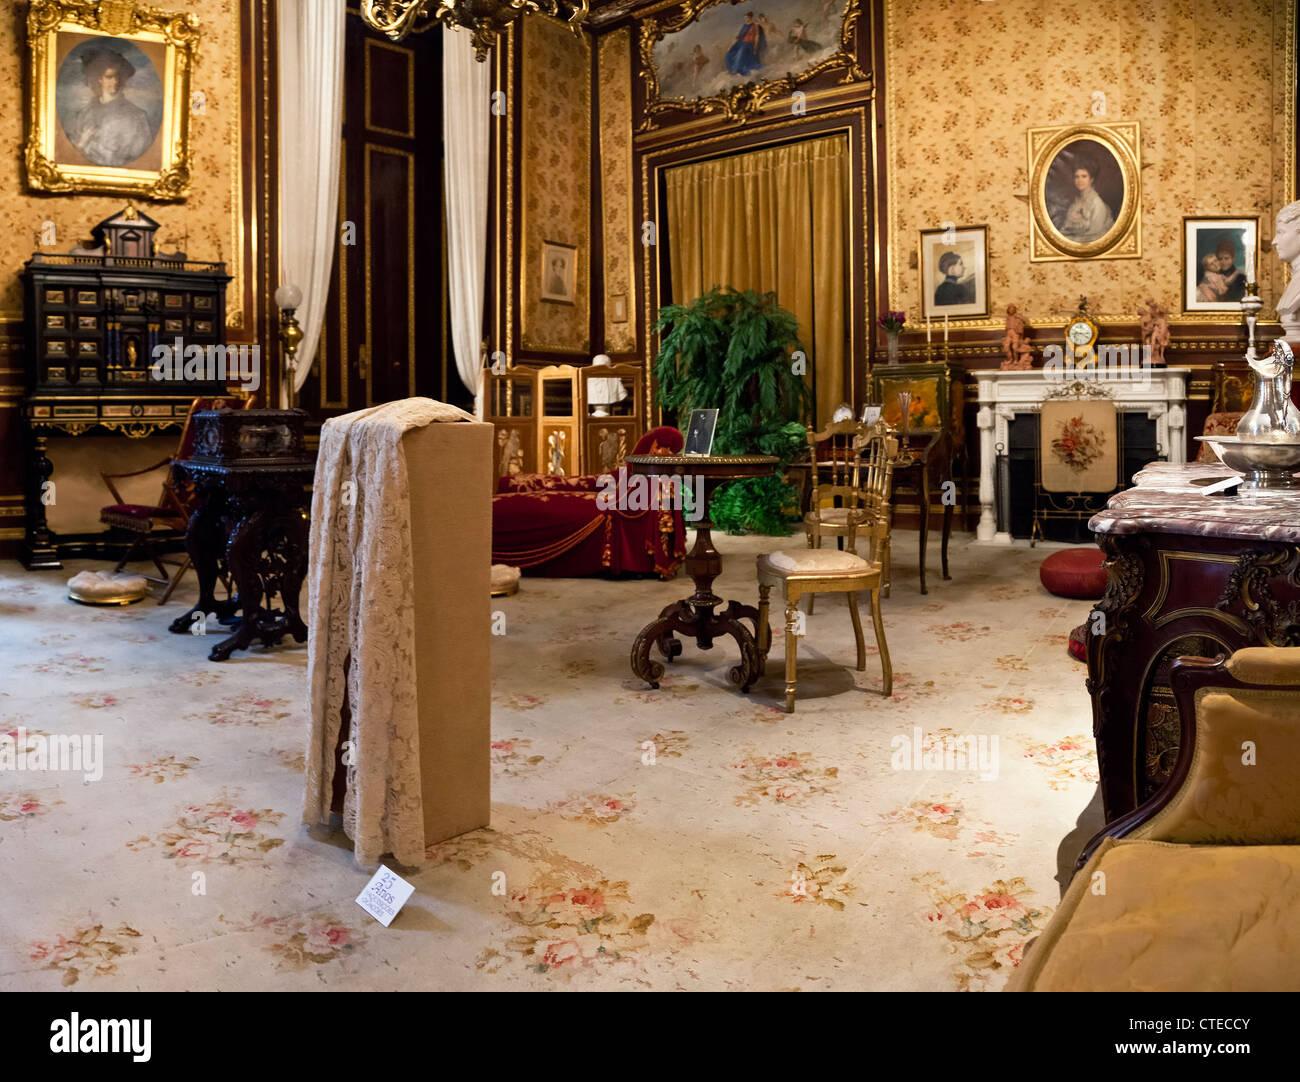 Toilette Room (Toucador da Rainha) - Ajuda National Palace, Lisbon, Portugal. 19th century neoclassical Royal palace. - Stock Image